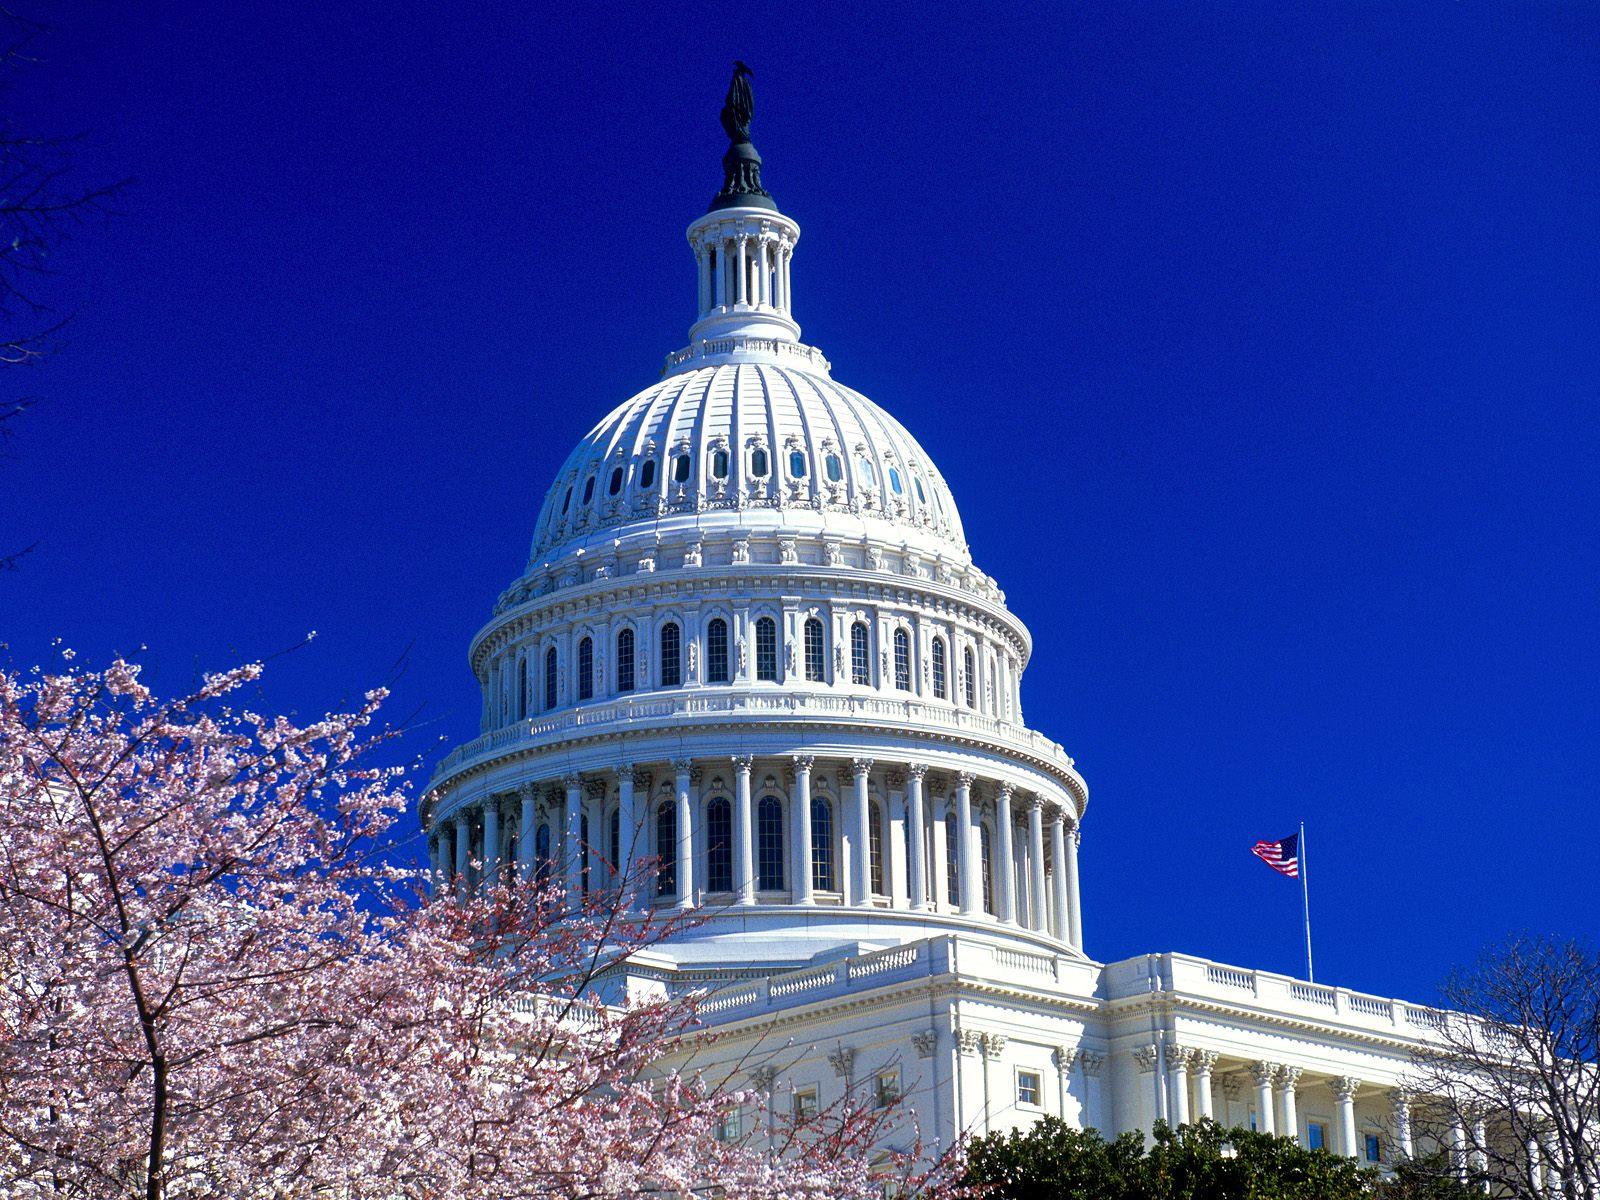 United states capitol wallpaper 1600x1200 15194 1600x1200